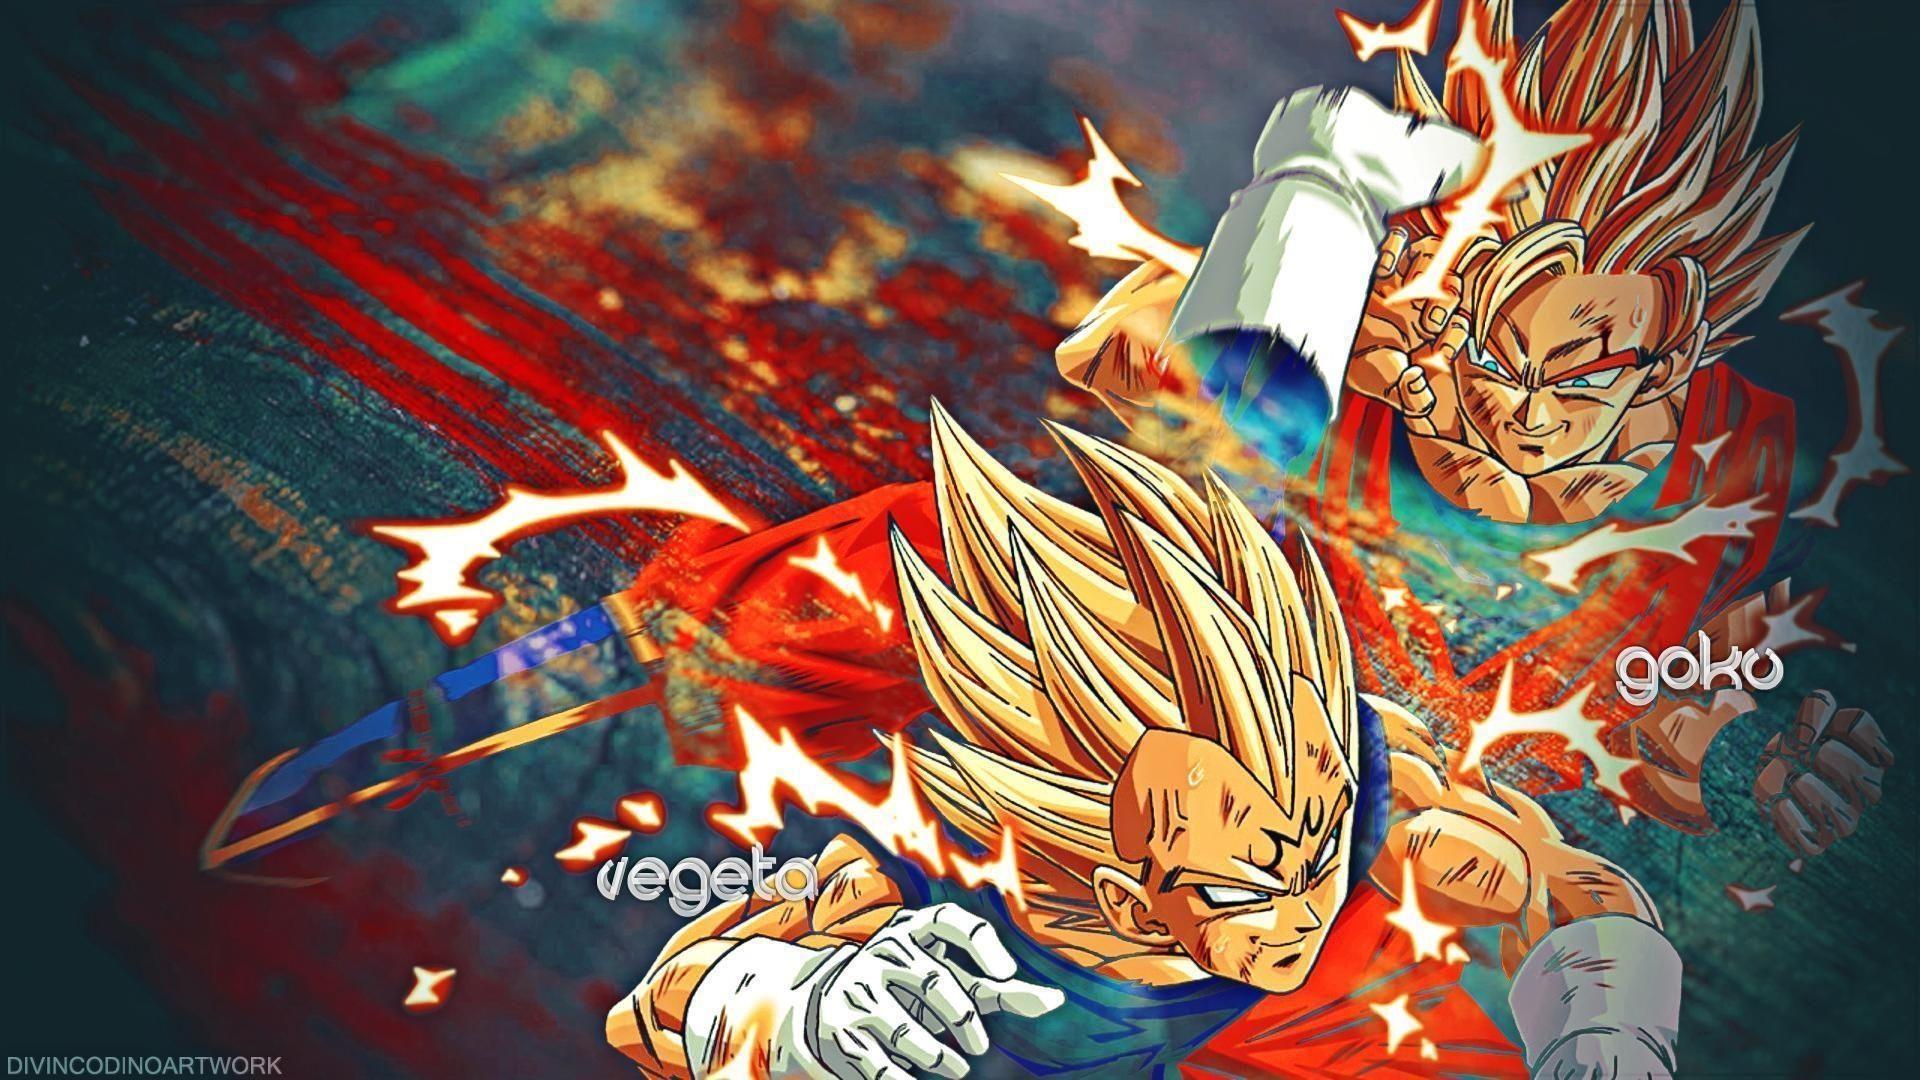 10 Best Dragon Ball Z Desktop Wallpapers Full Hd 1920 1080 For Pc